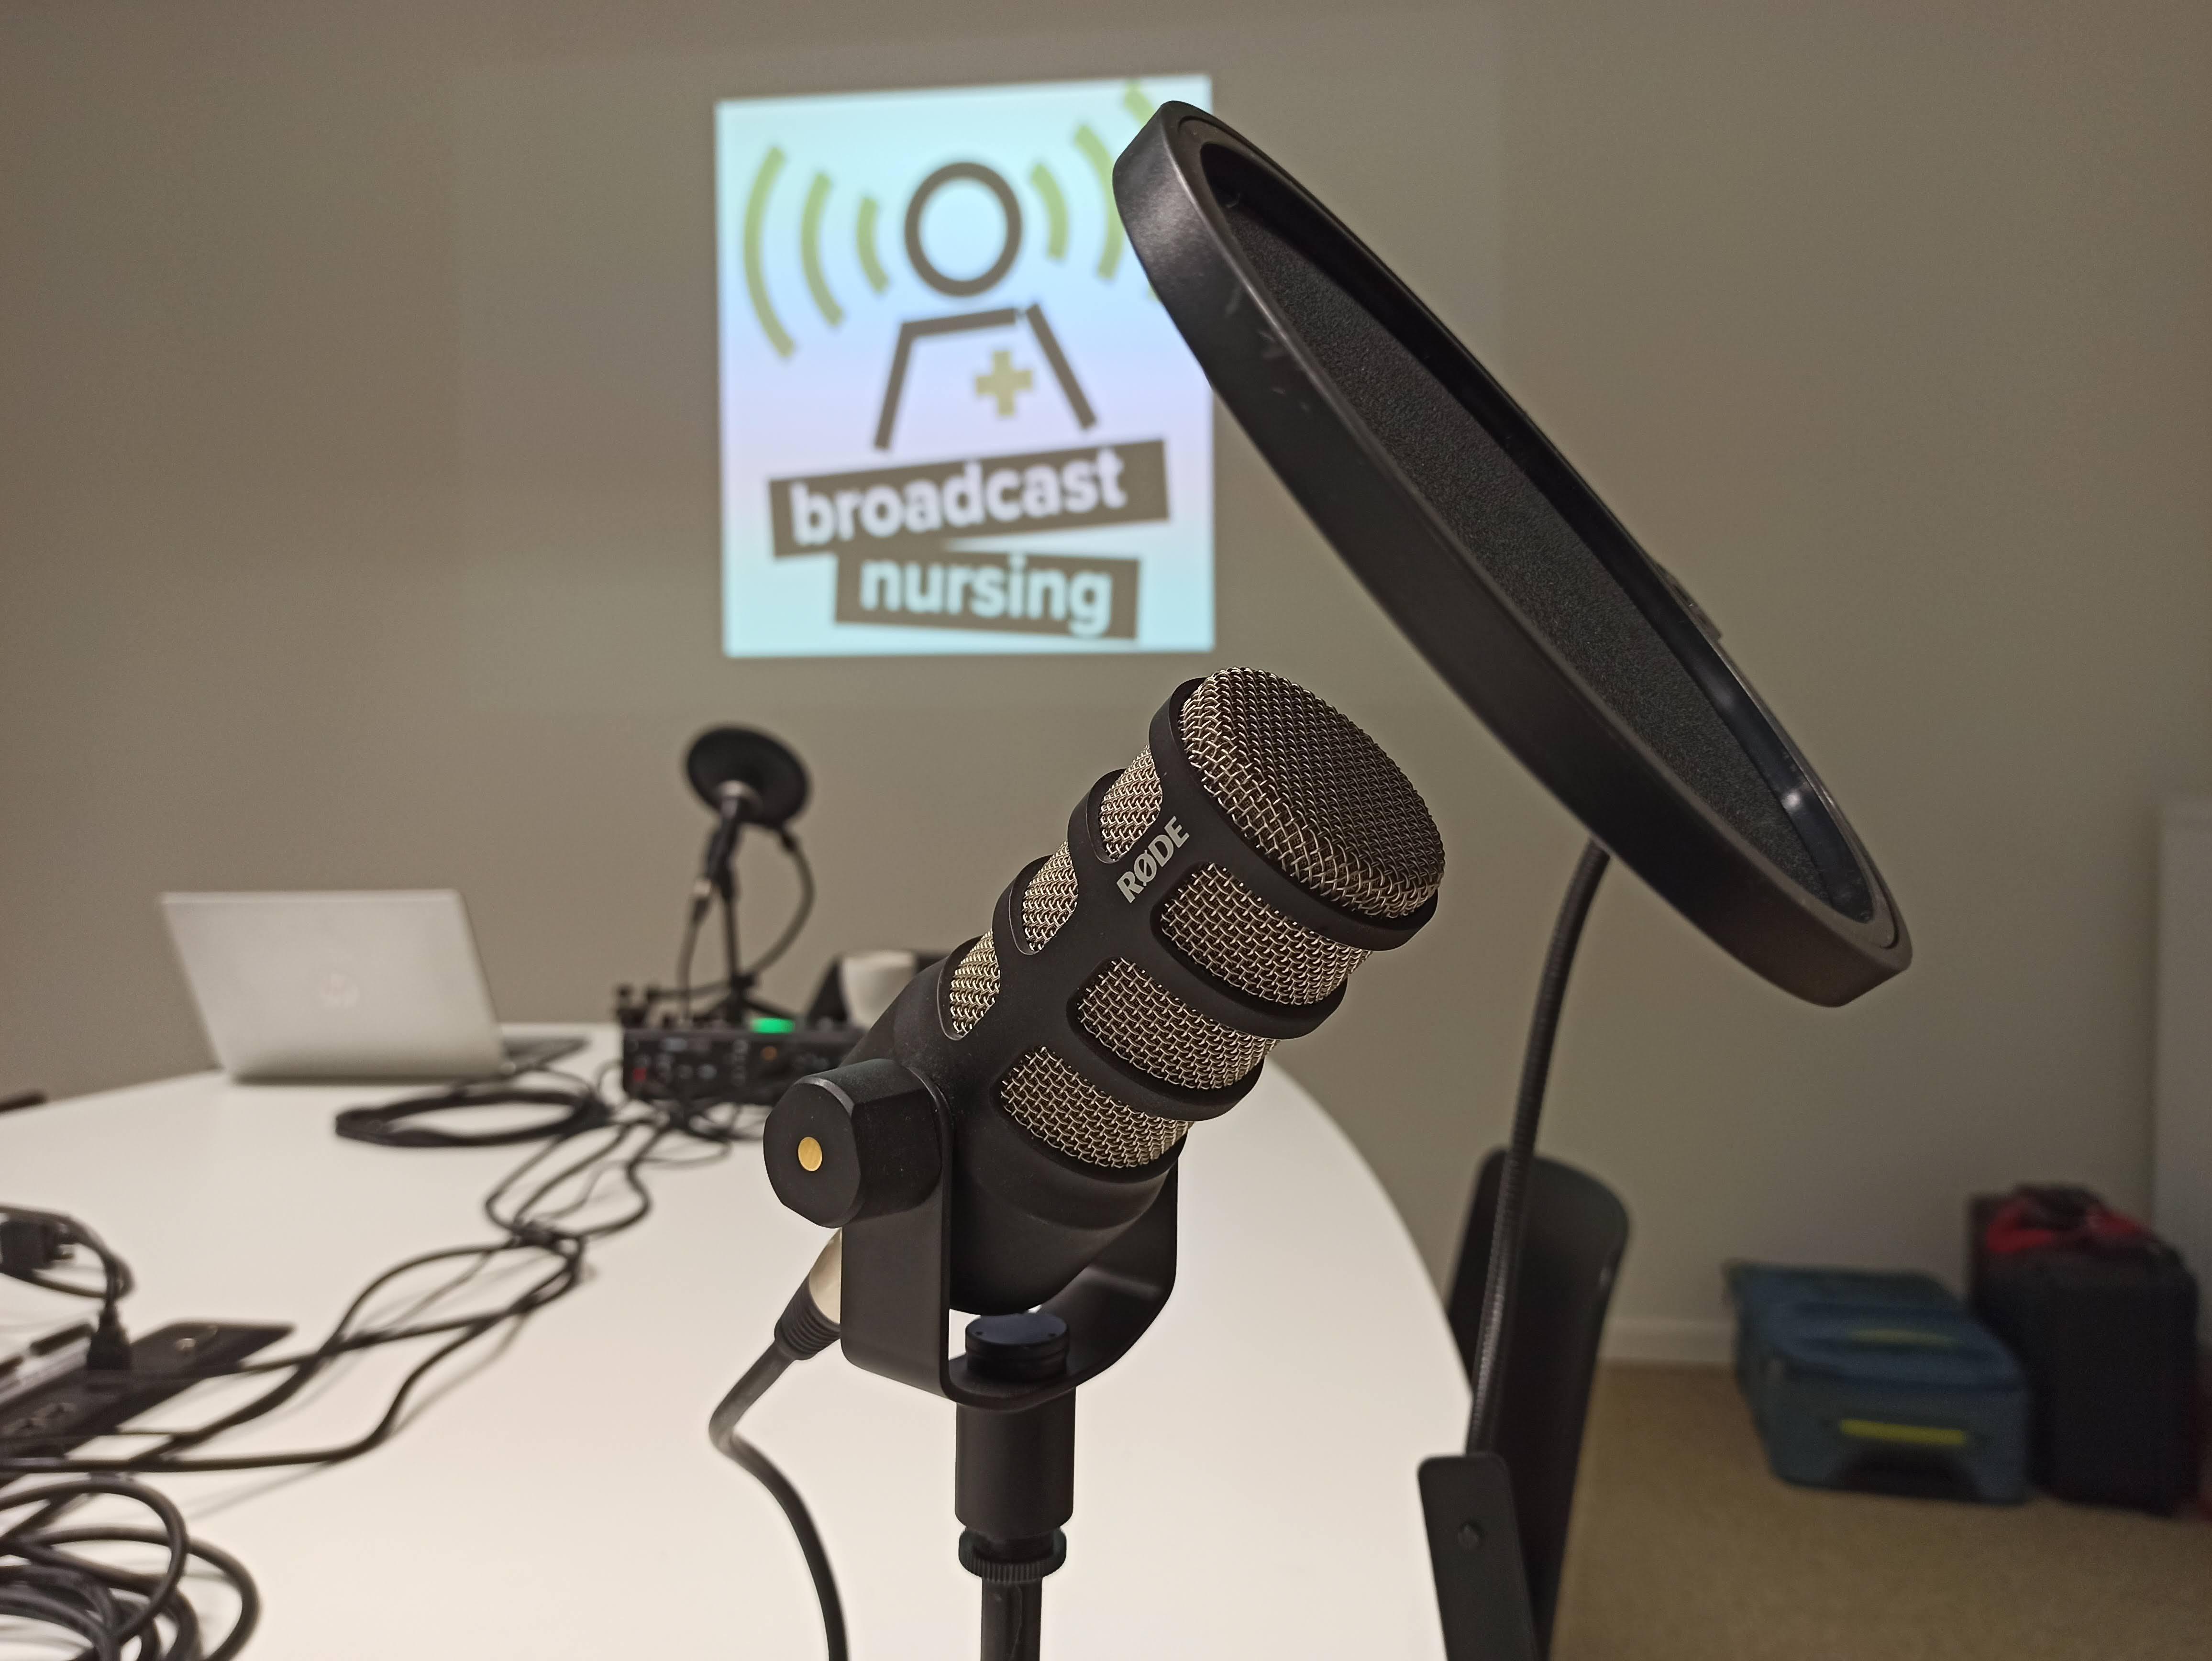 Broadcast Nursing KdG